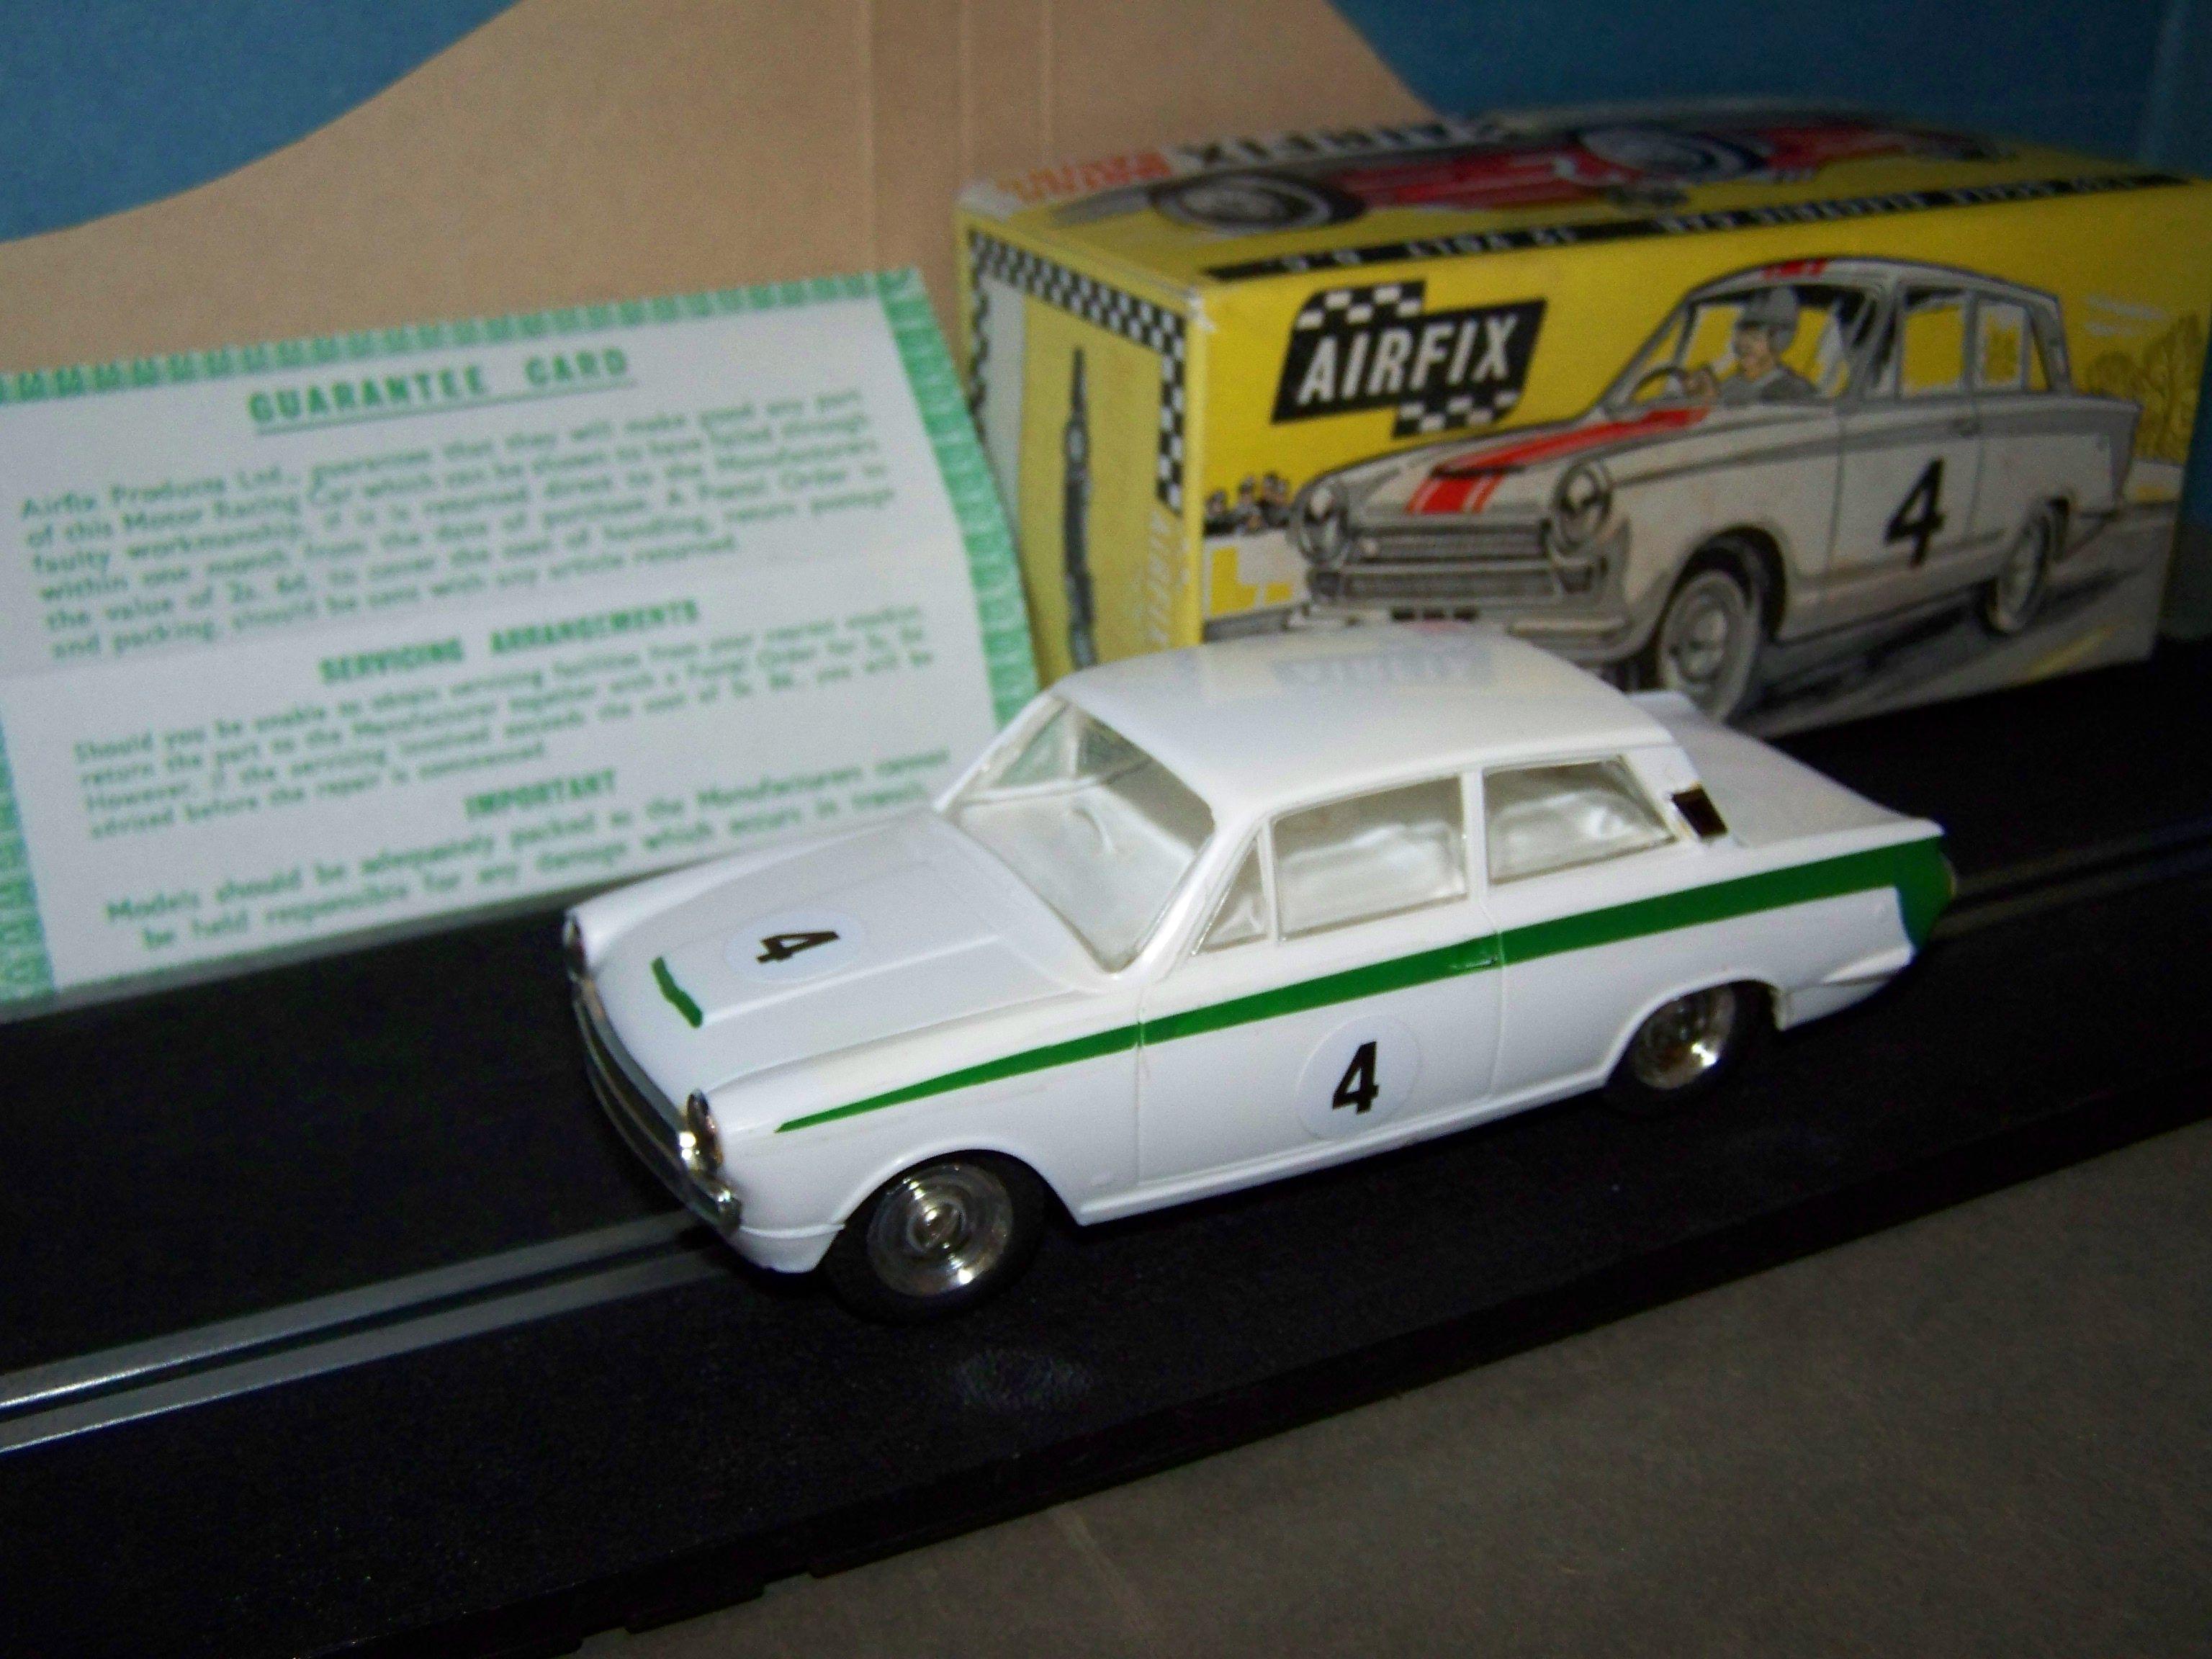 Major Airfix Racing Airfix Mrrc 5166 Lotus Cortina Type 1 Boxed